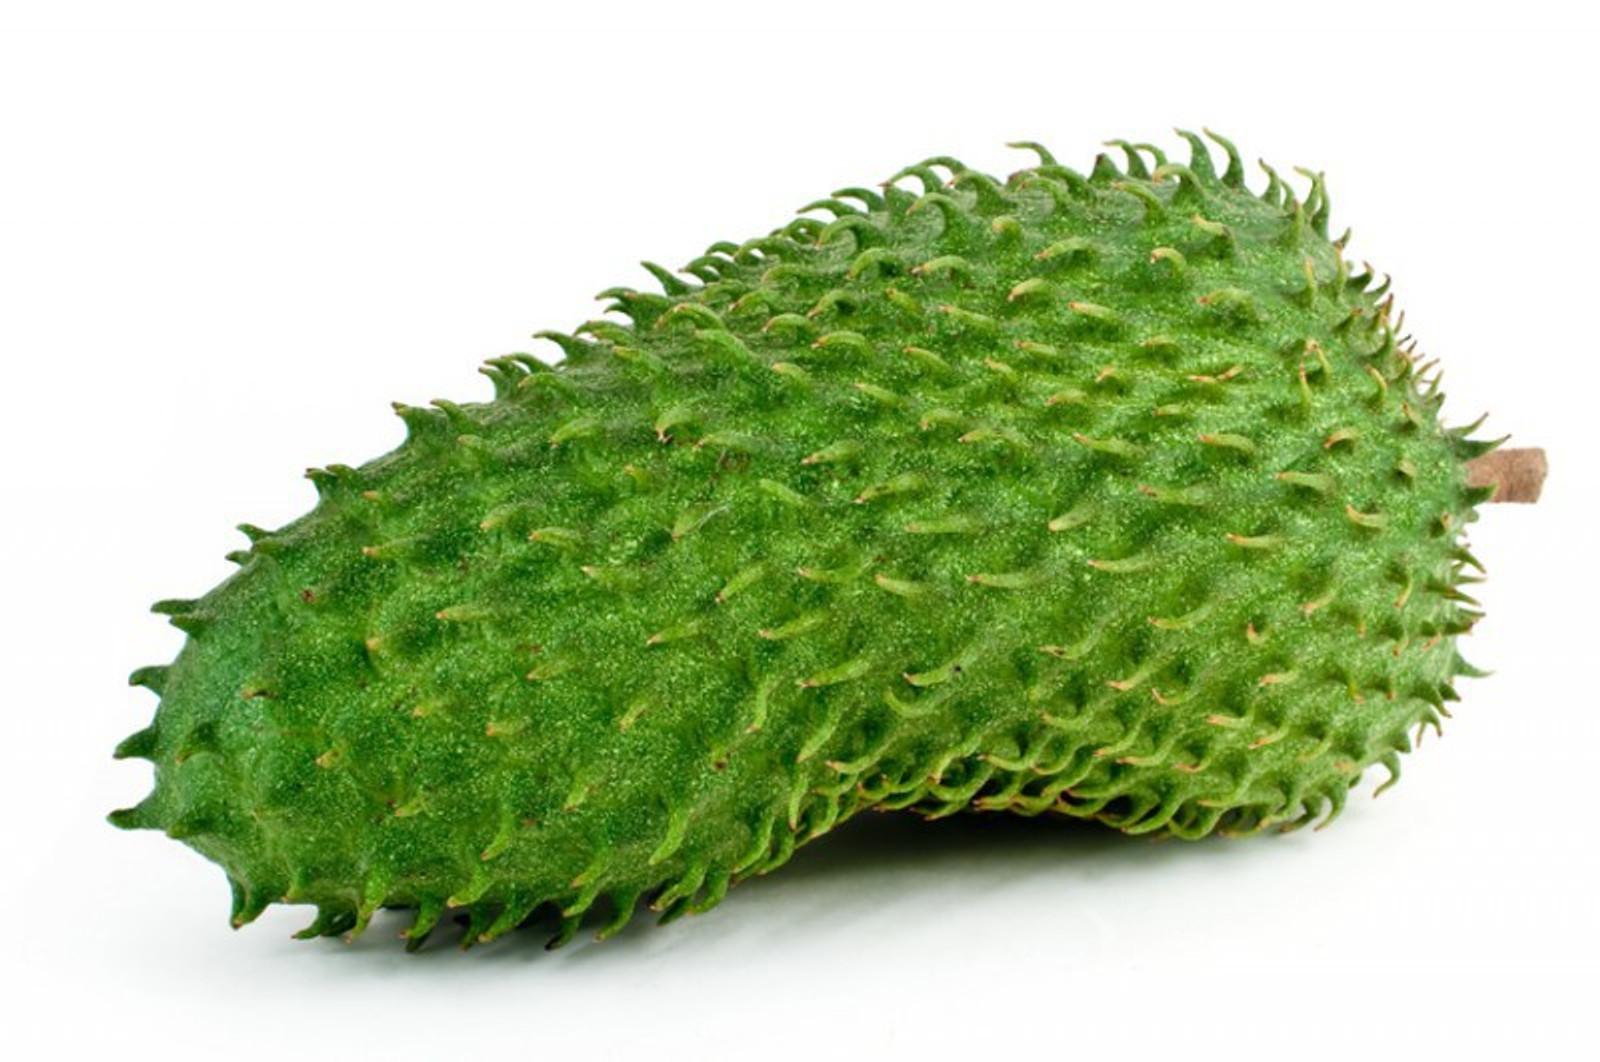 Graviola 100% Frucht - Püree pur. (Guanábana, Stachelannone, Soursop, Guyabano oder Corossol), 6 KG = 60x100g Portionen